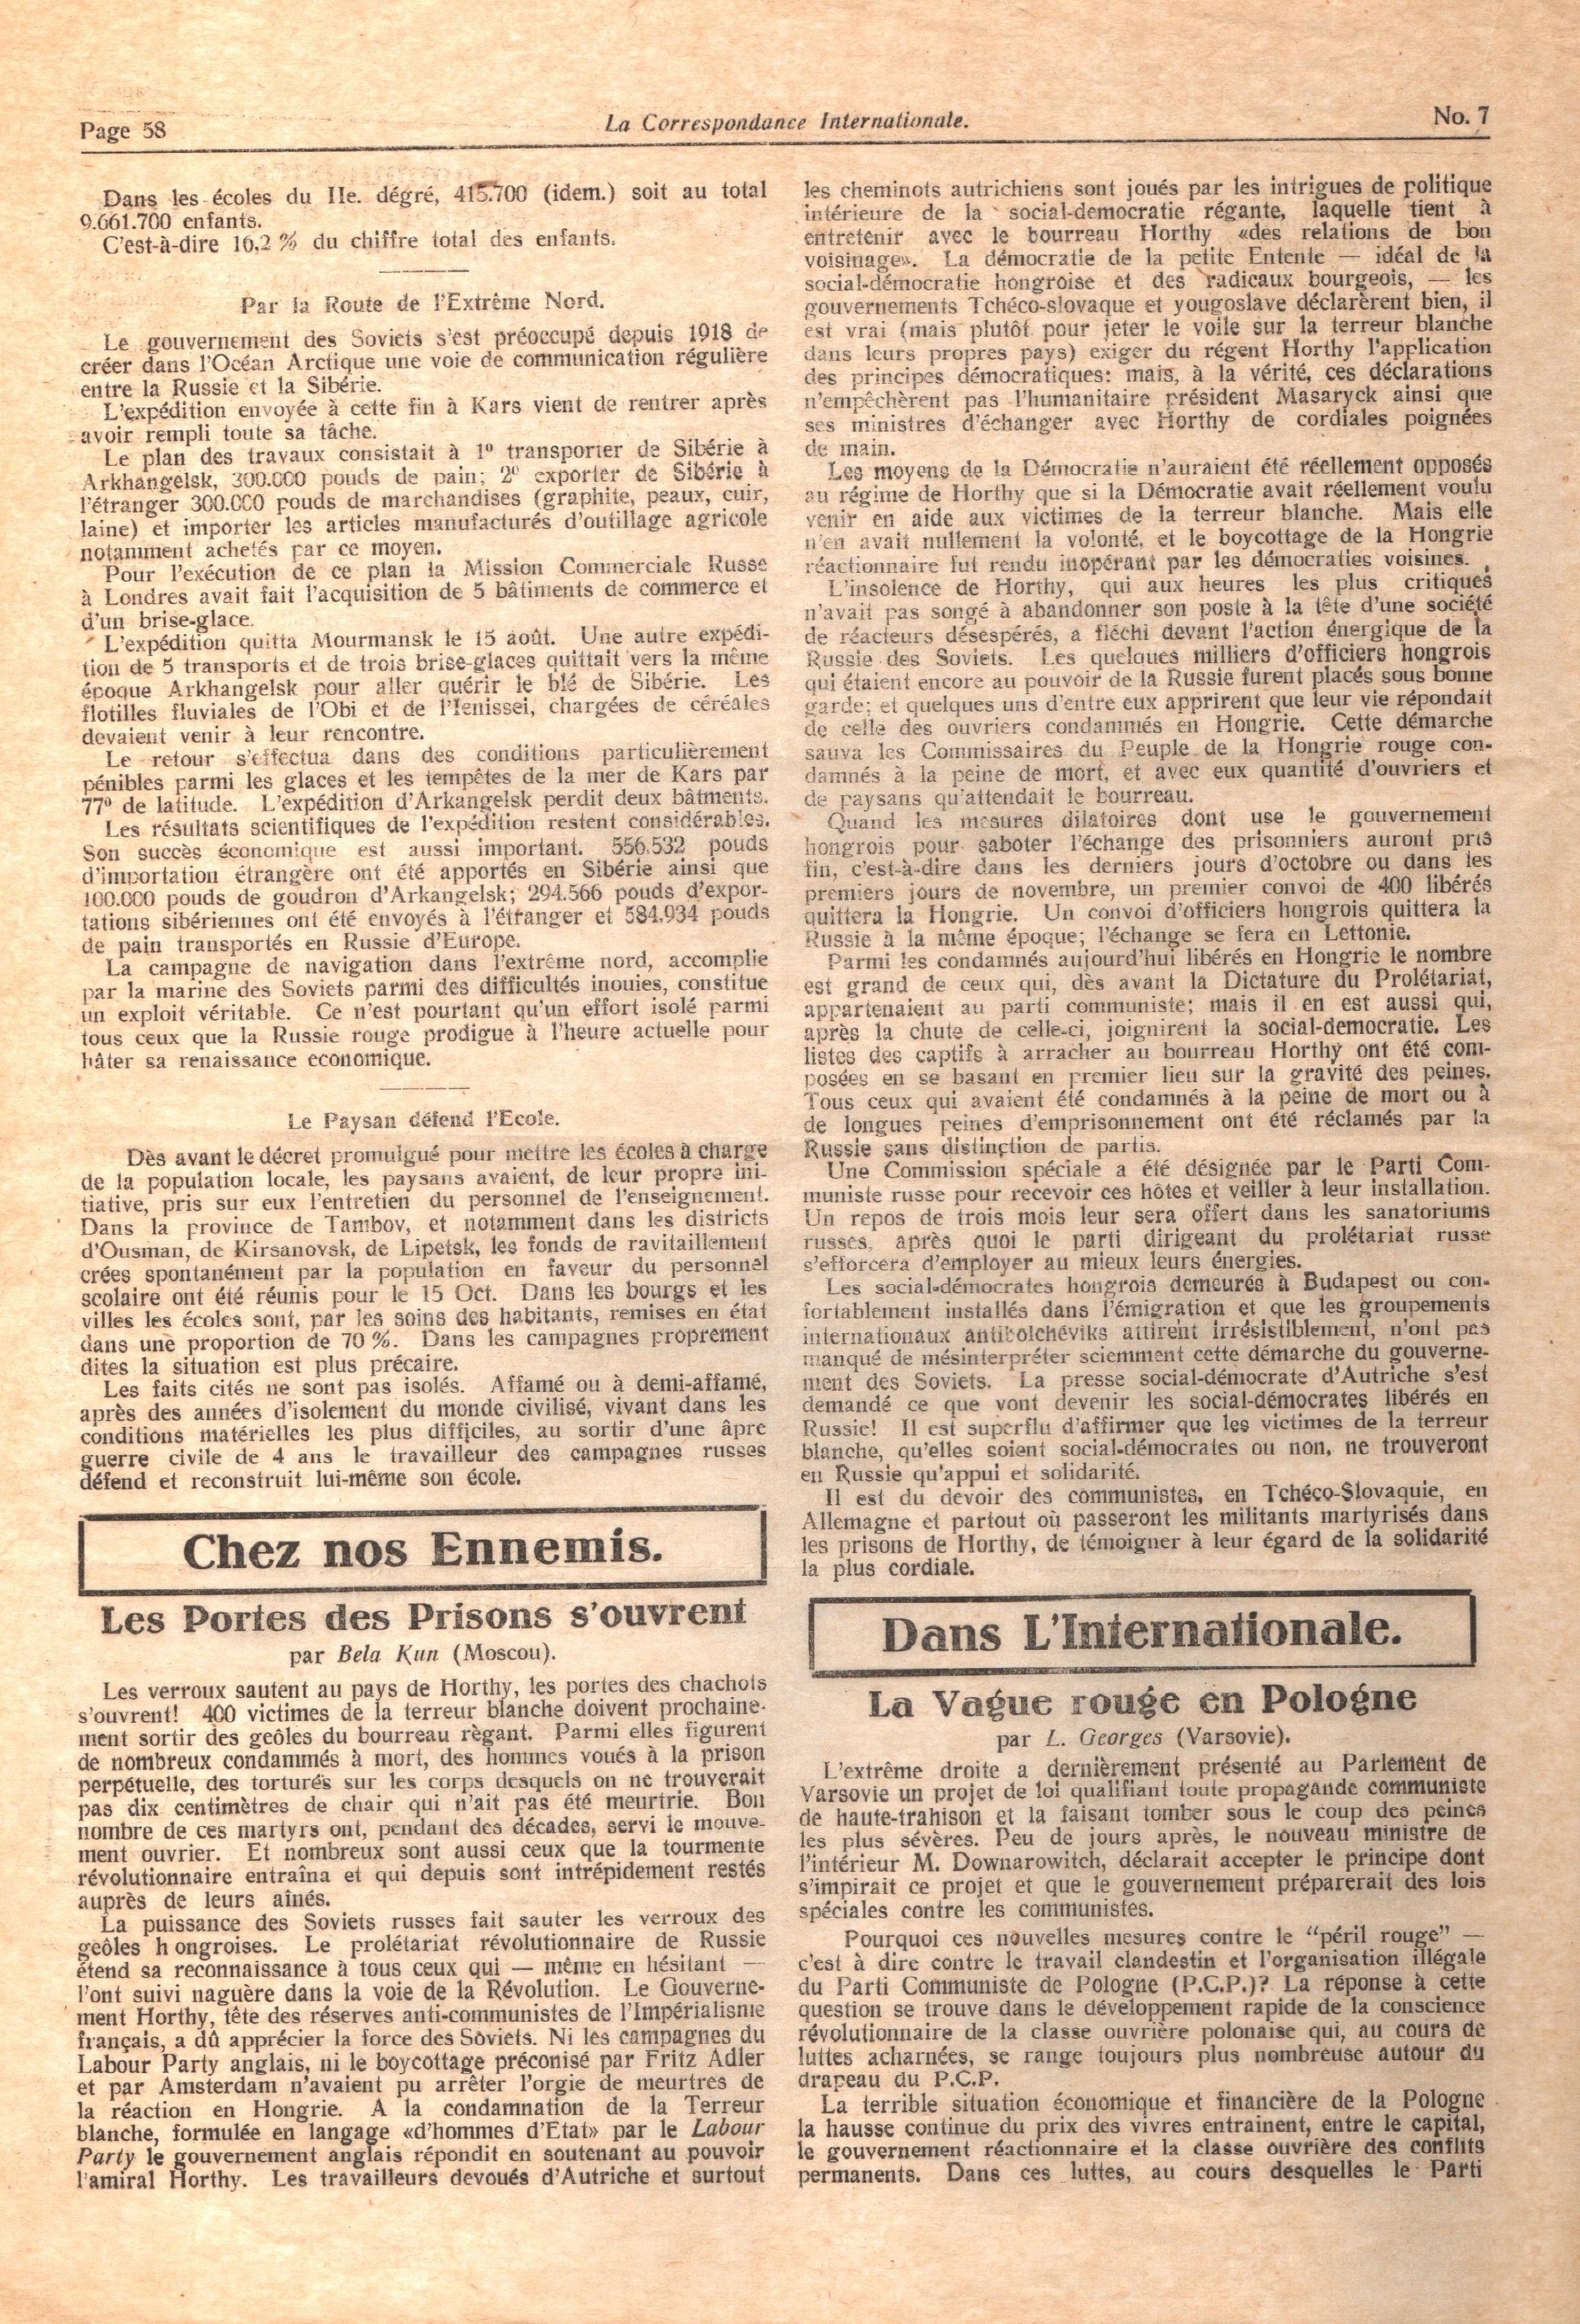 La Correspondance Internationale 7 - pag. 06